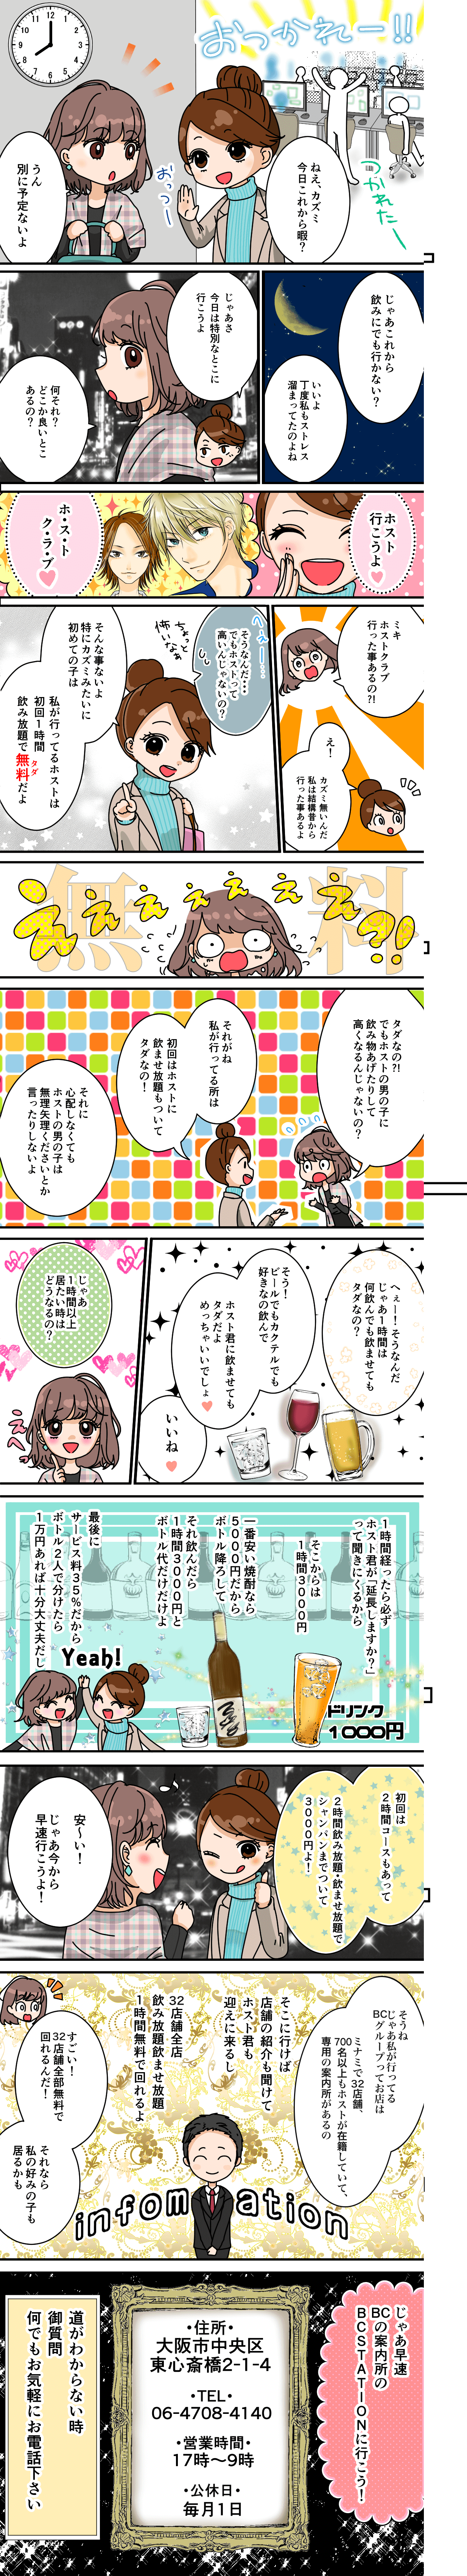 system_manga